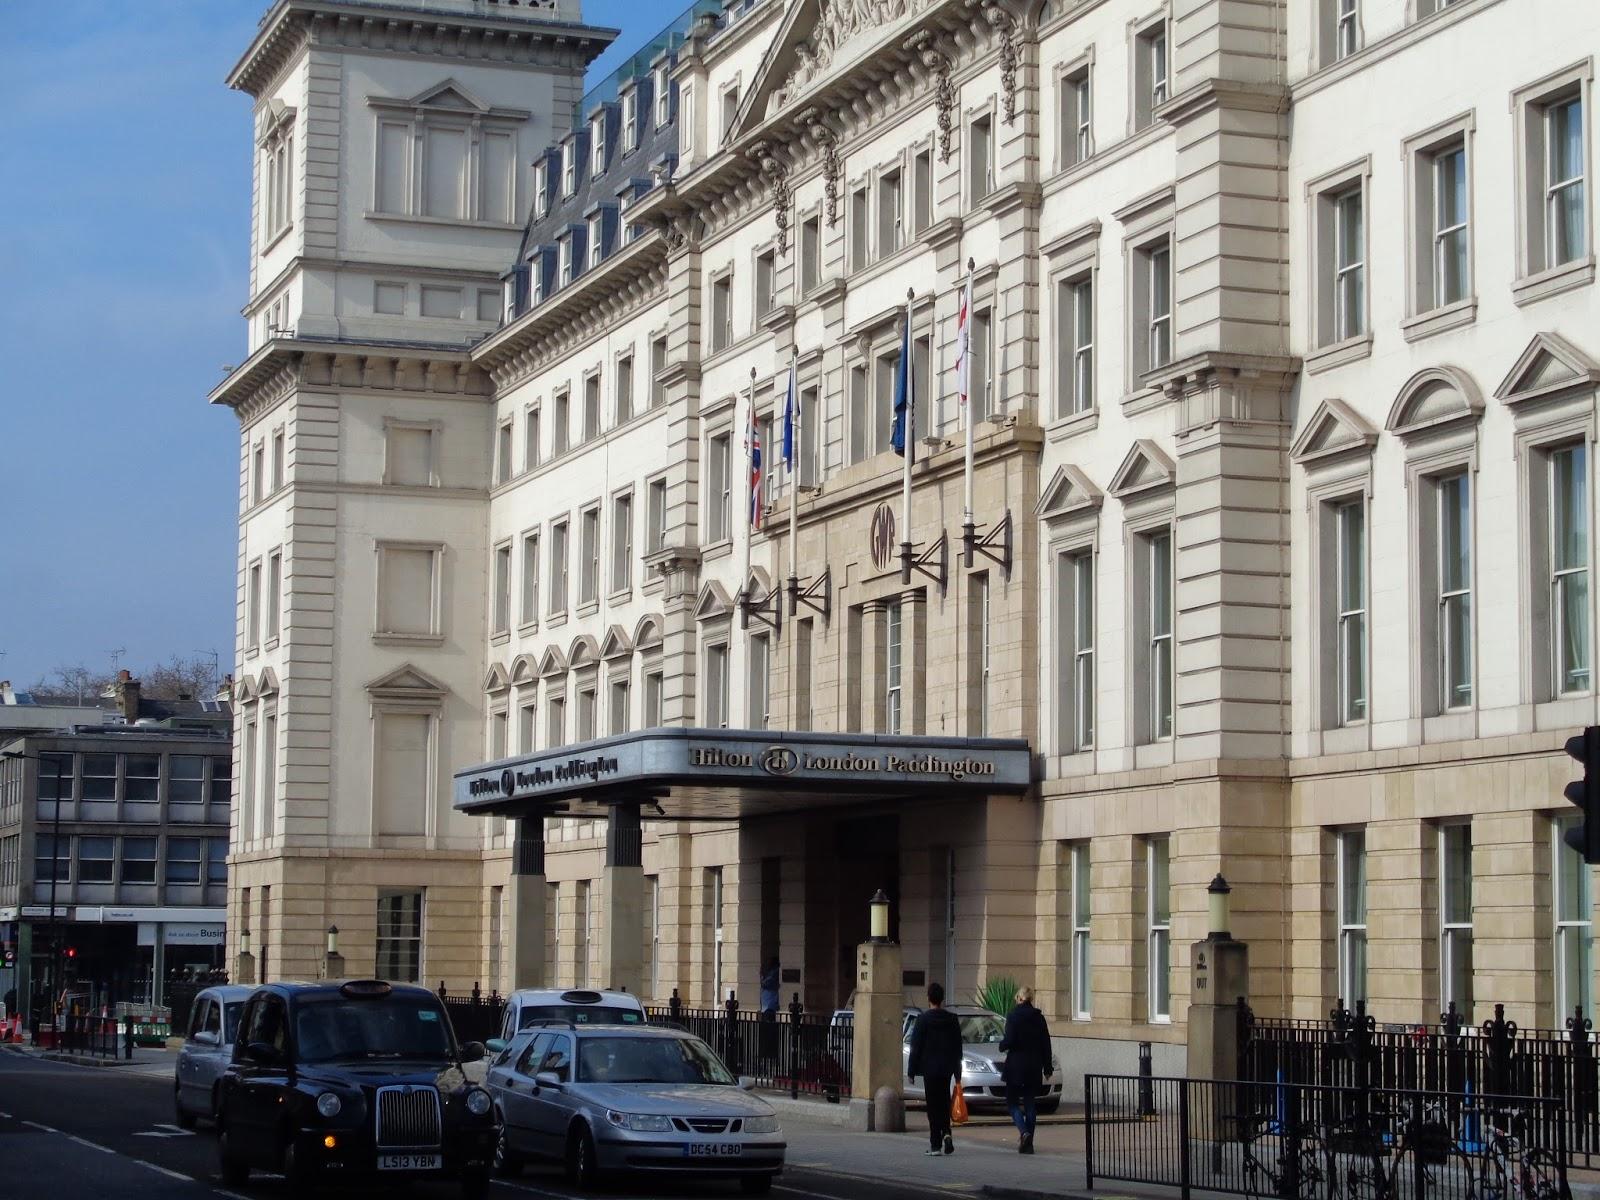 Brunel Hotel London